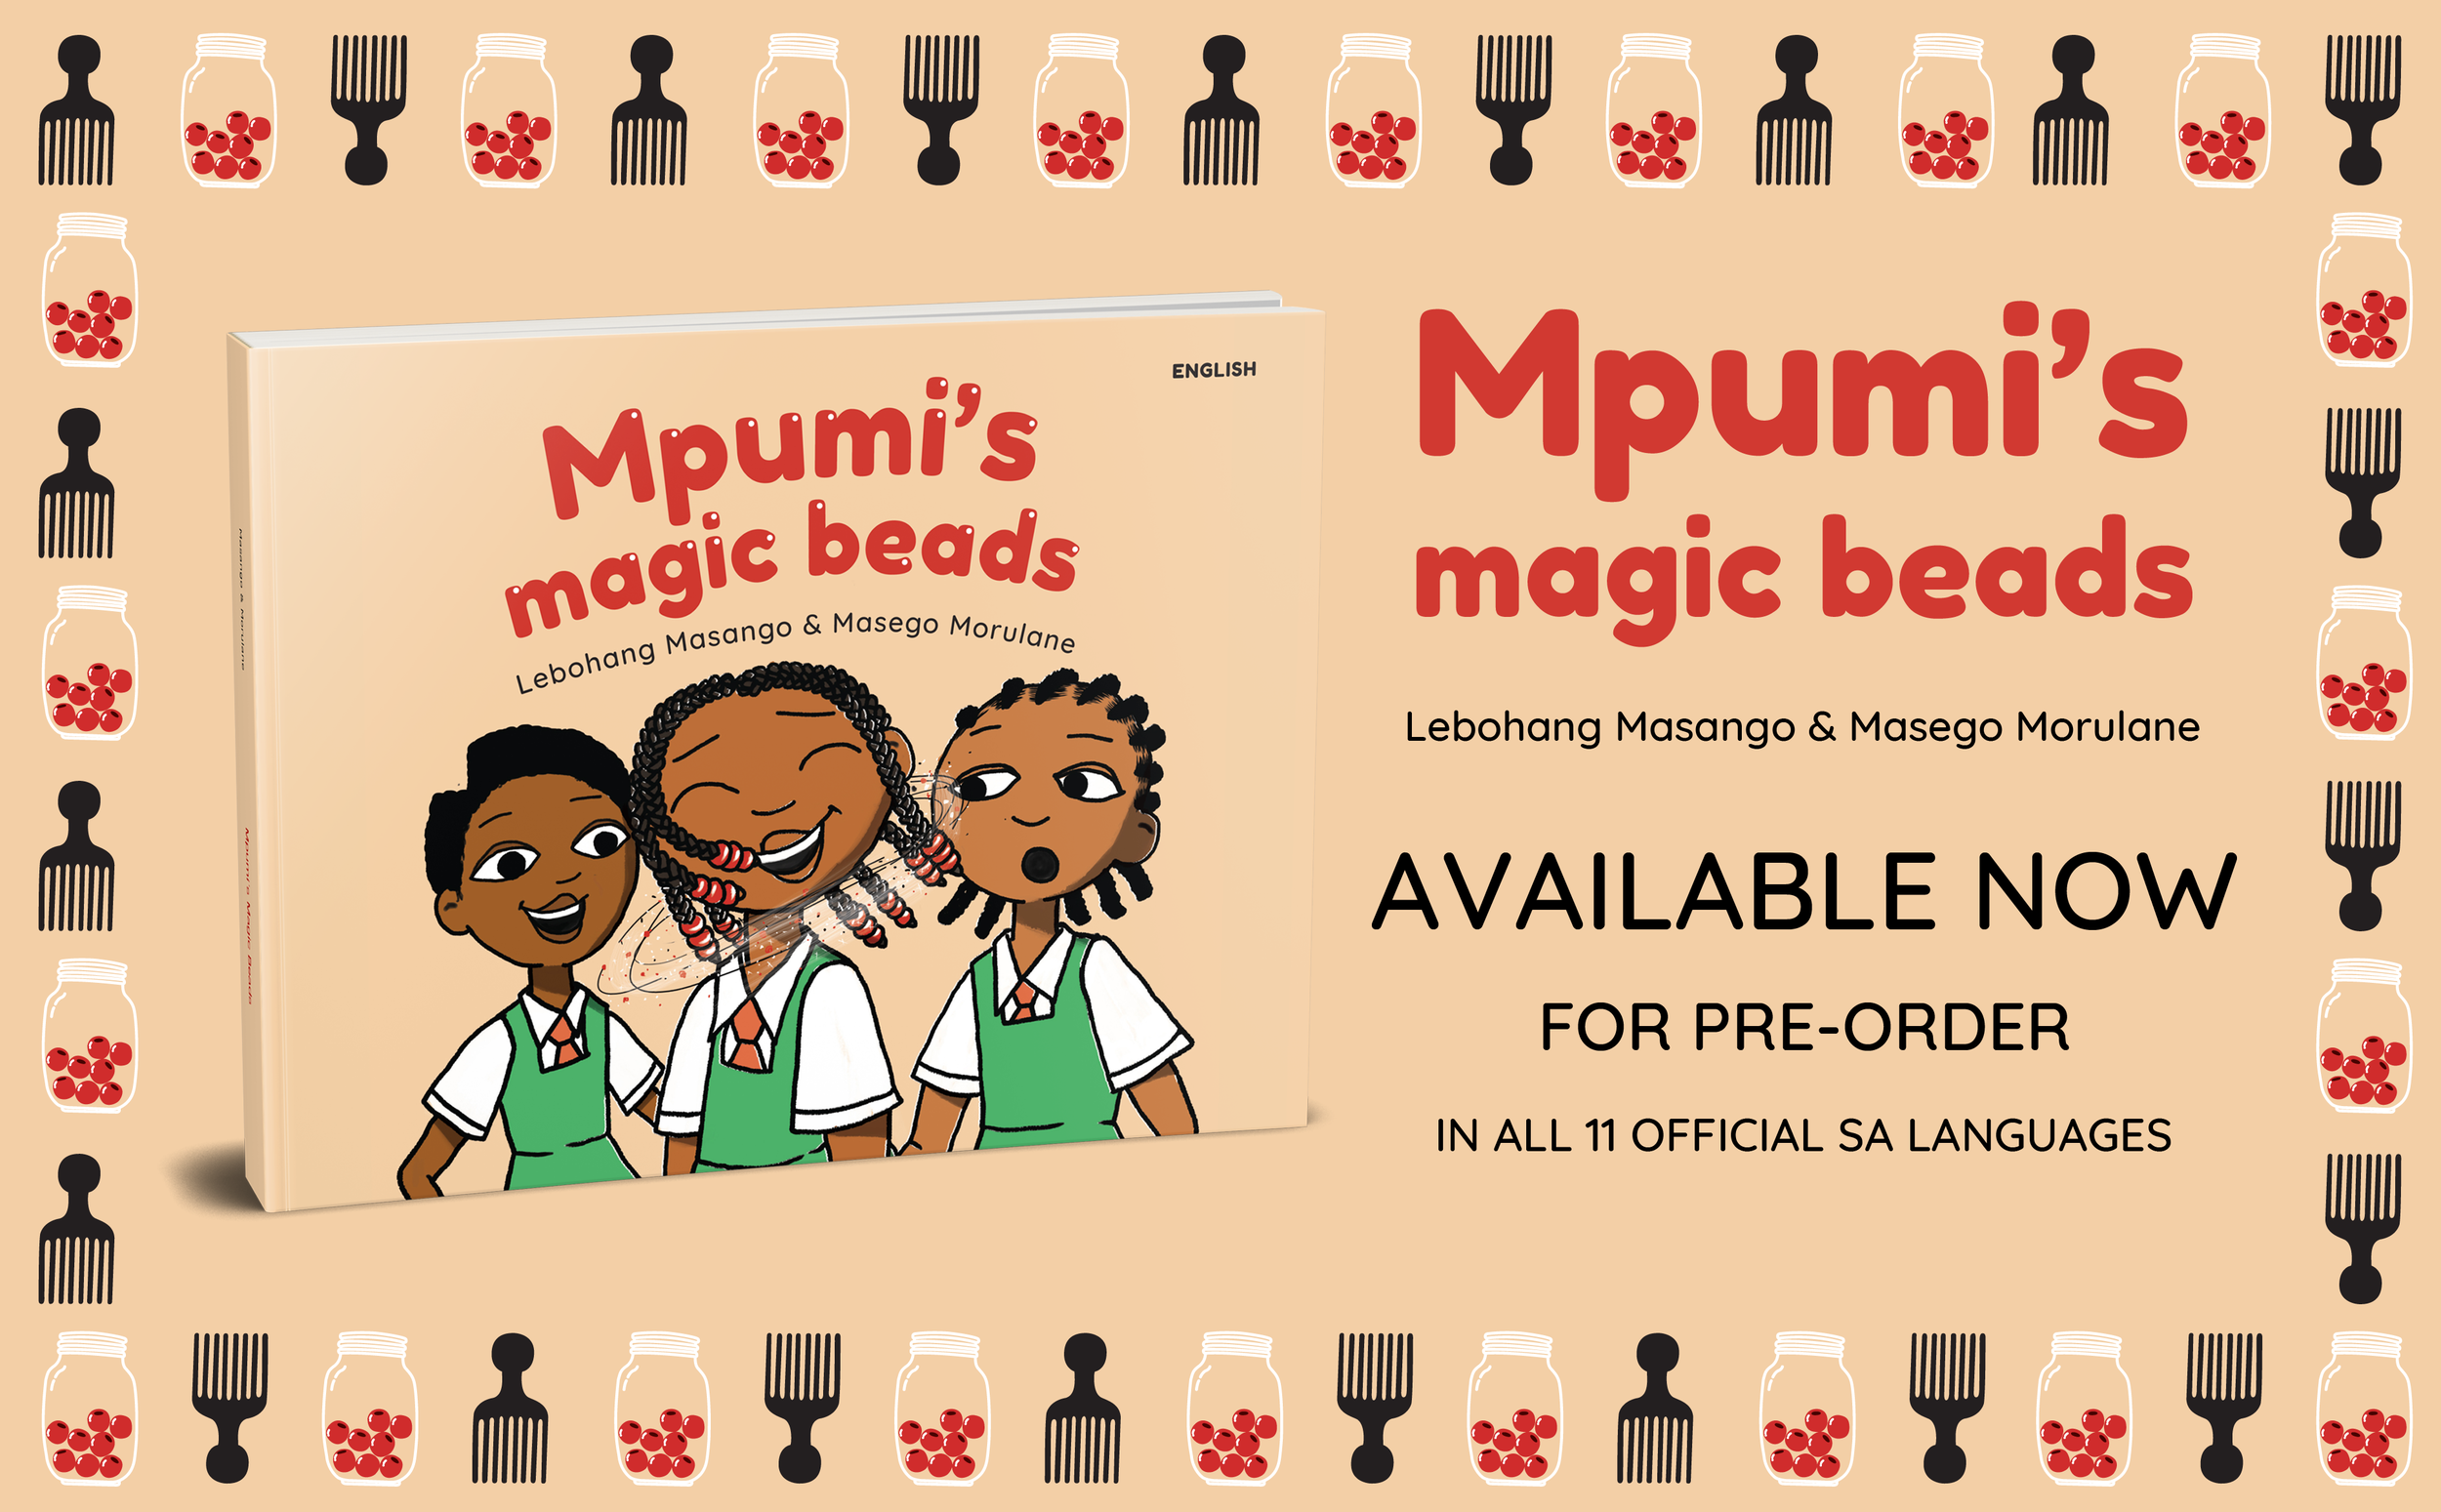 Mpumi's-Magic-Beads-Pre-Order-Promo.png